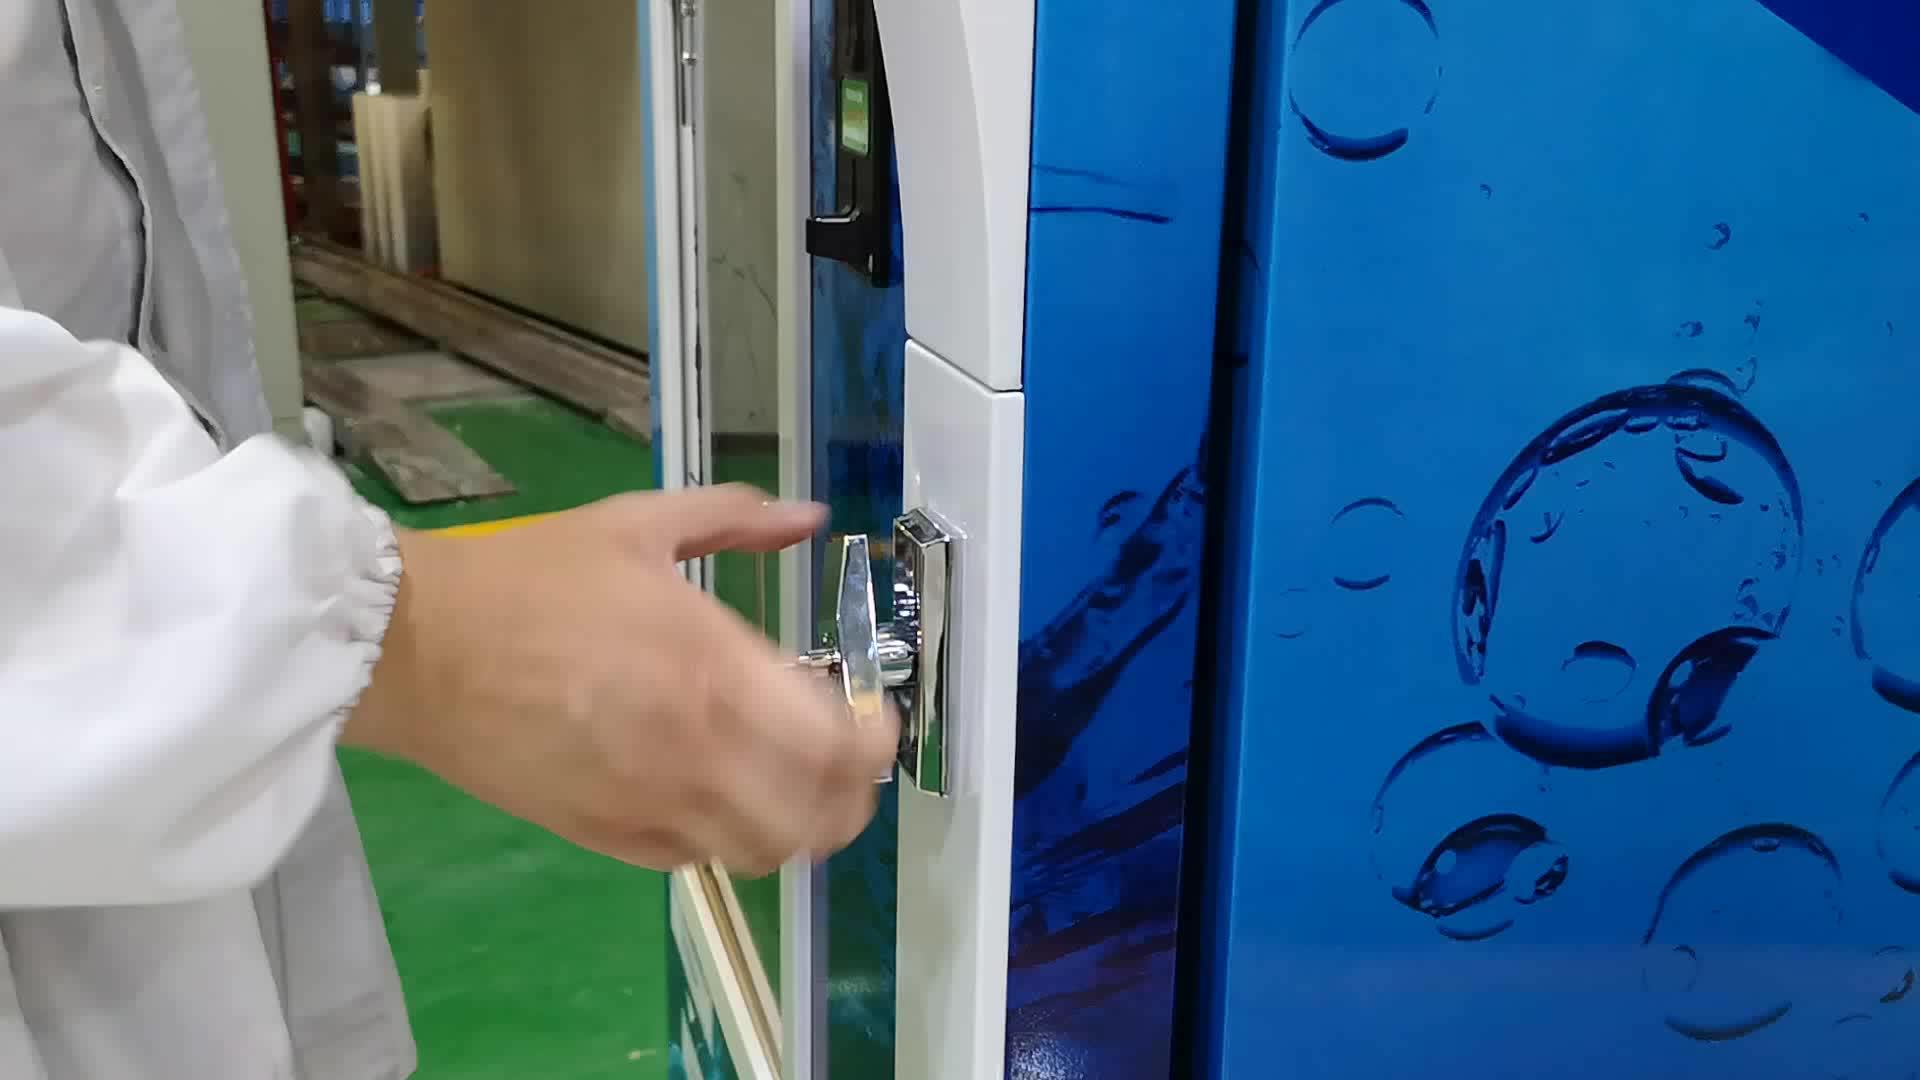 Outdoor 24 h self-service automatische reverse pure gletsjer water automaat